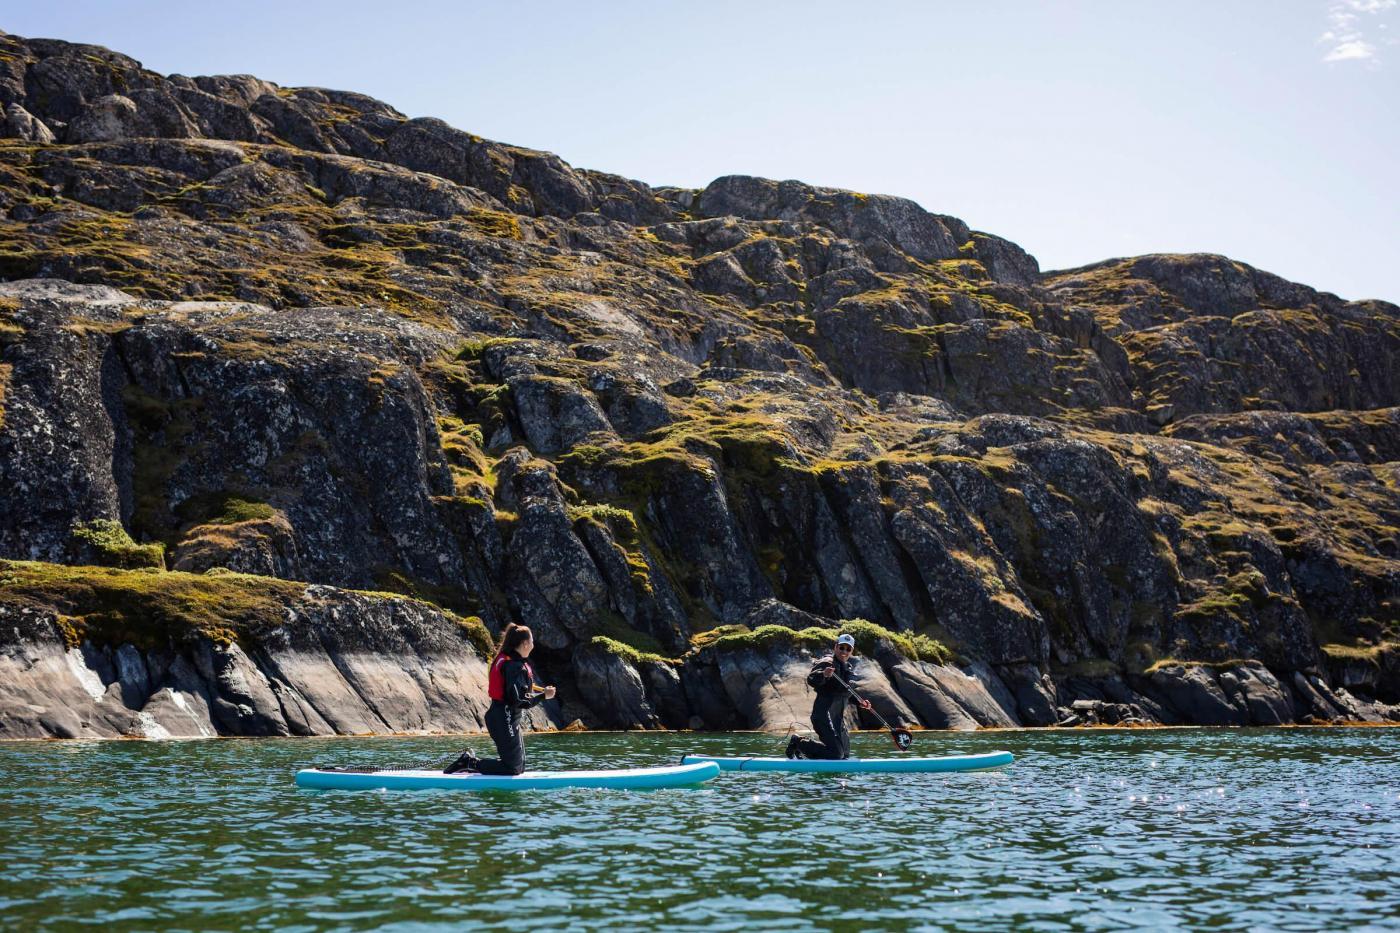 SUPs with rocky surroundings near Sisimiut. Photo - Aningaaq R. Carlsen, Visit Greenland